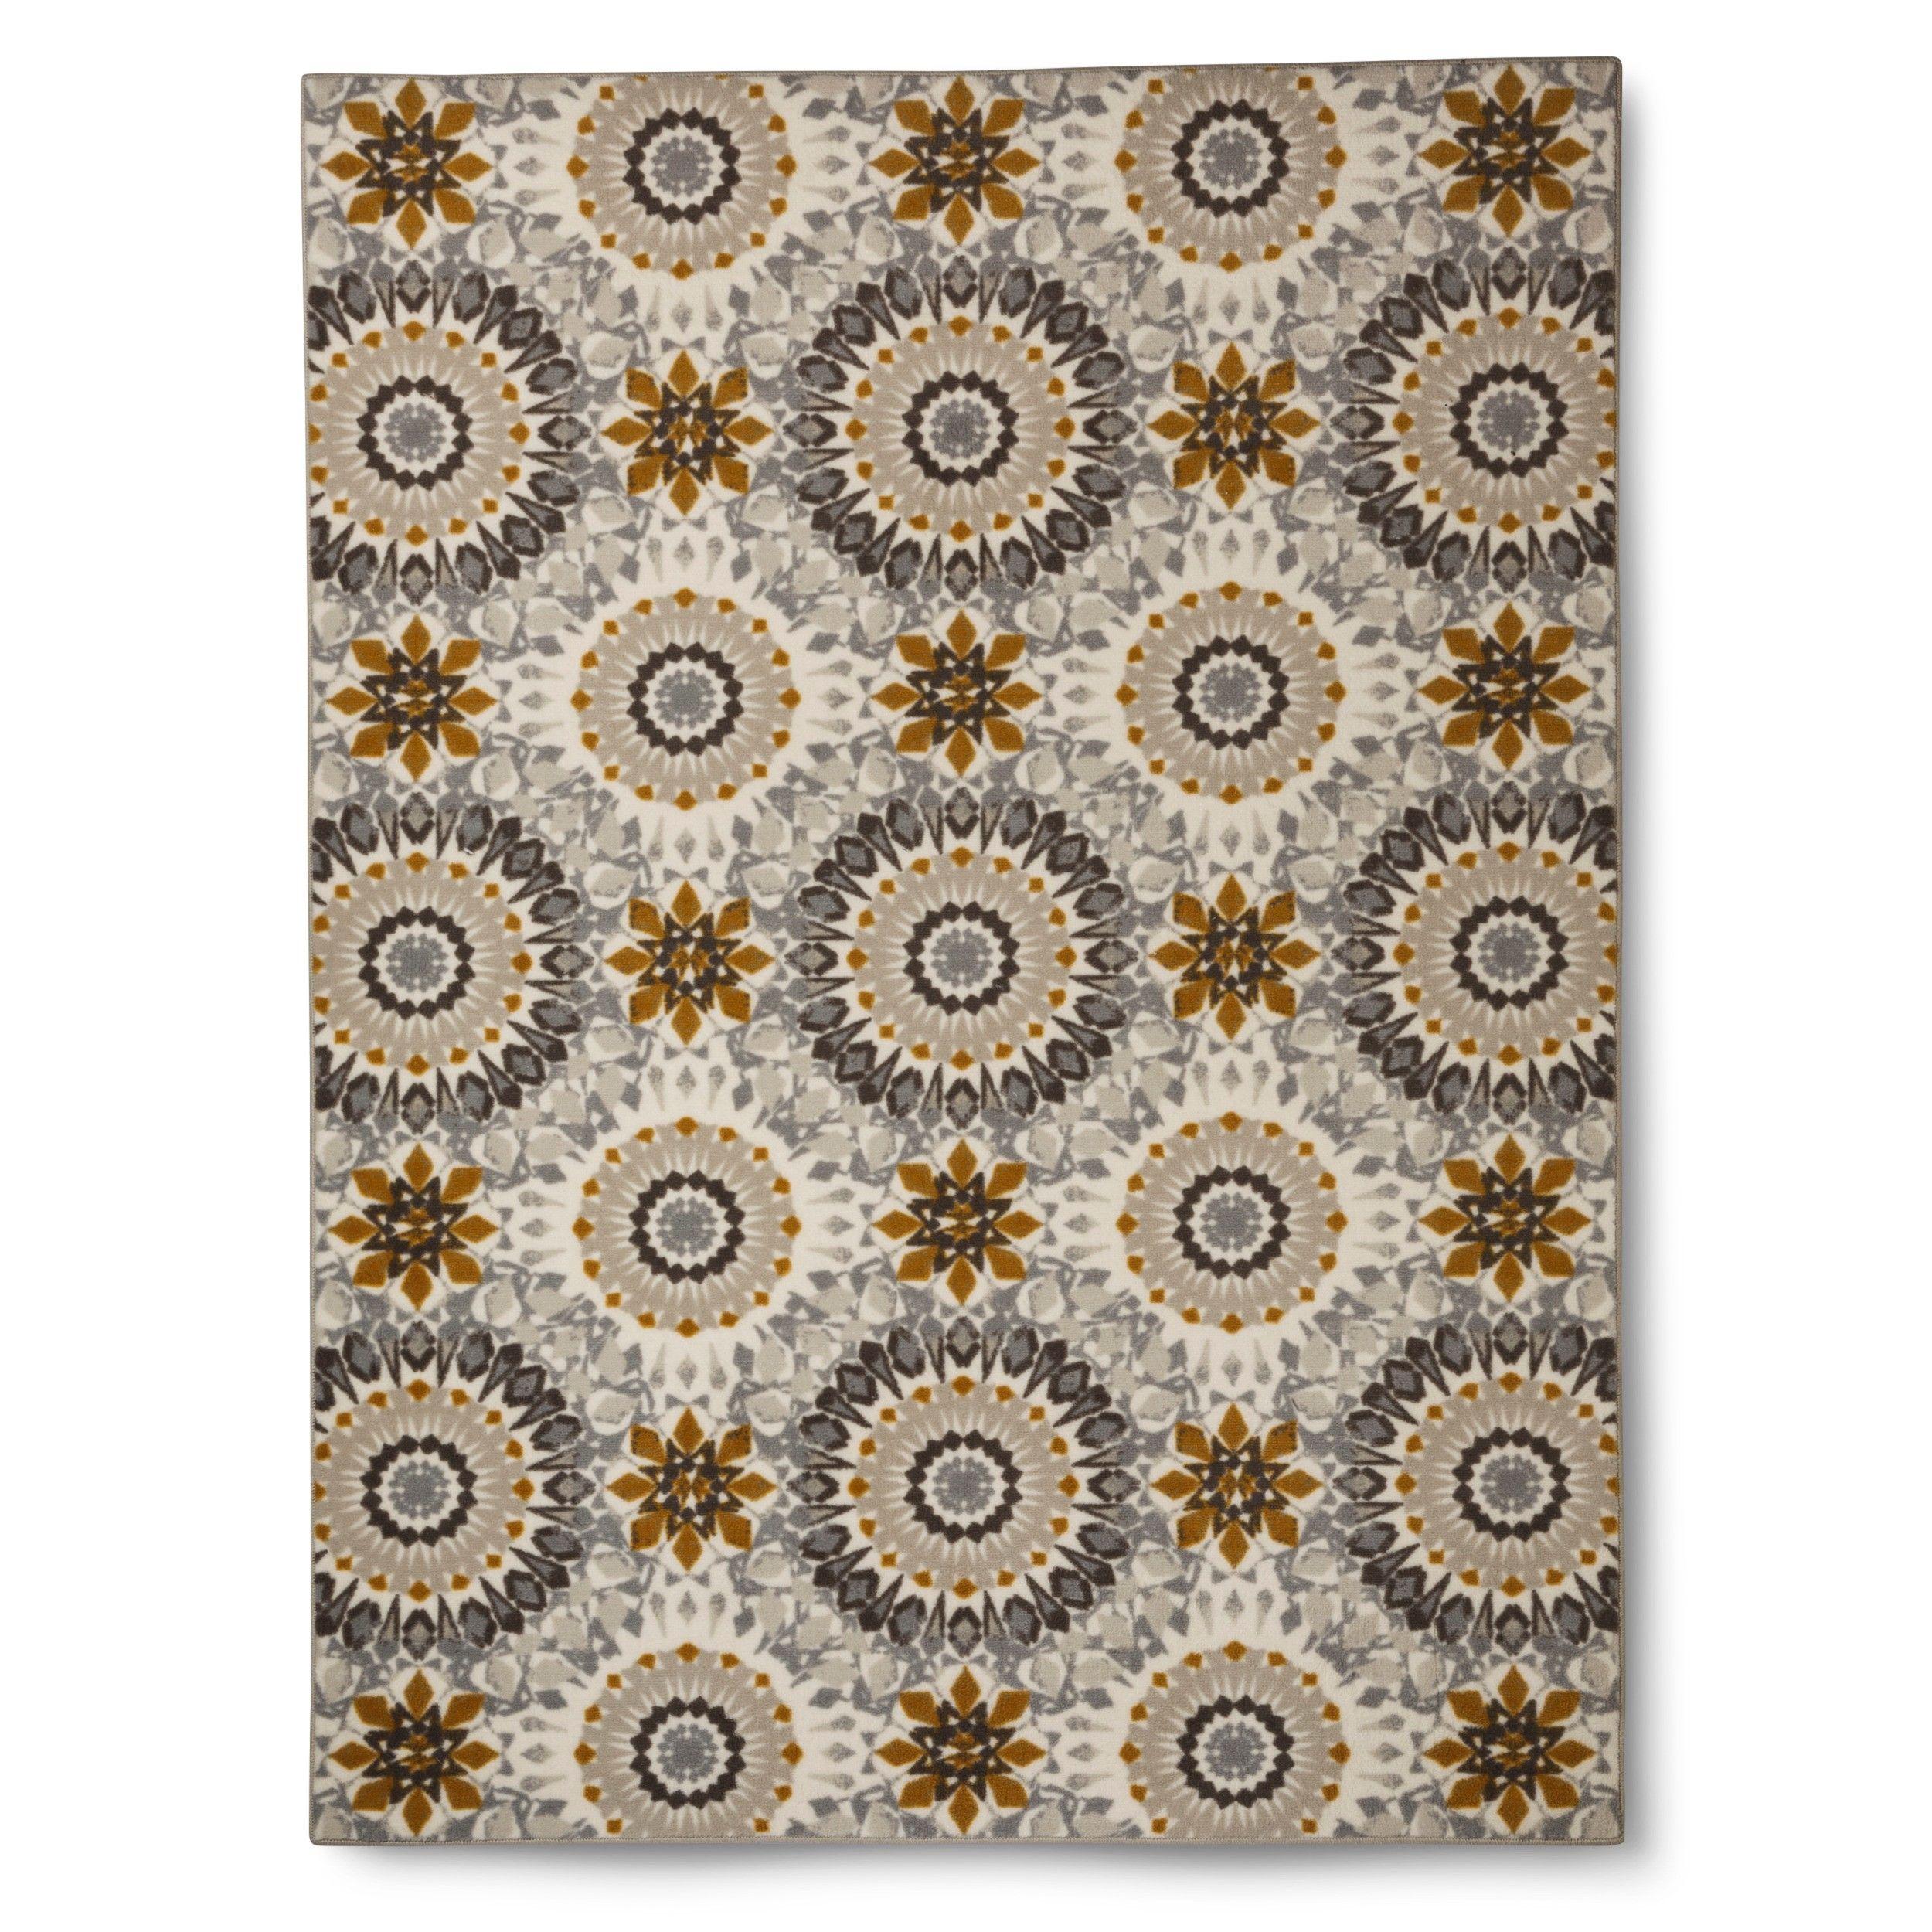 Threshold™ Kaleidoscope Rug : Target | A P A R T M E N T | Pinterest ...